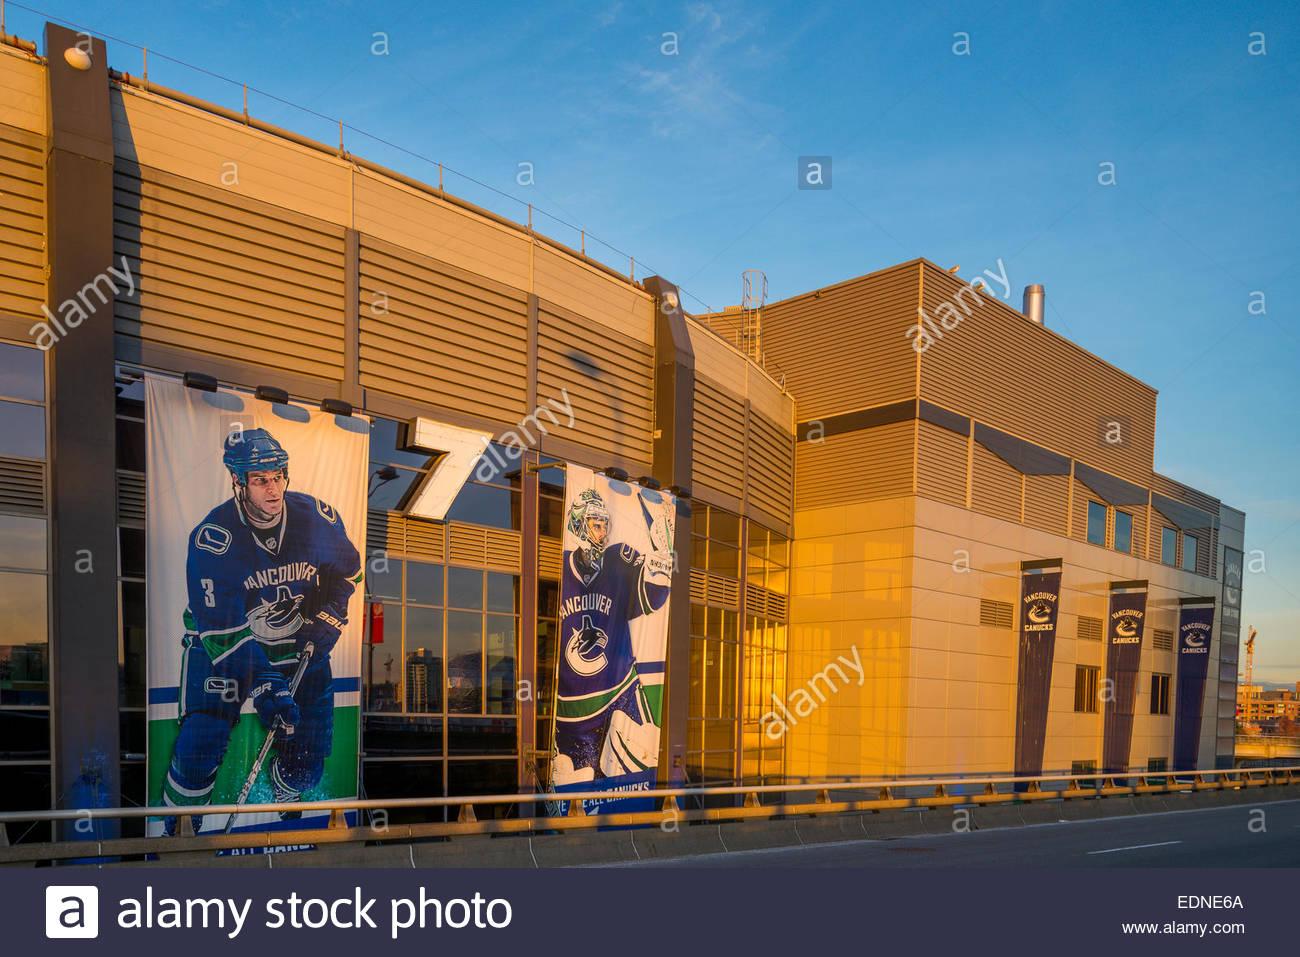 Roger's Arena Vancouver, British Columbia, Canada, - Stock Image